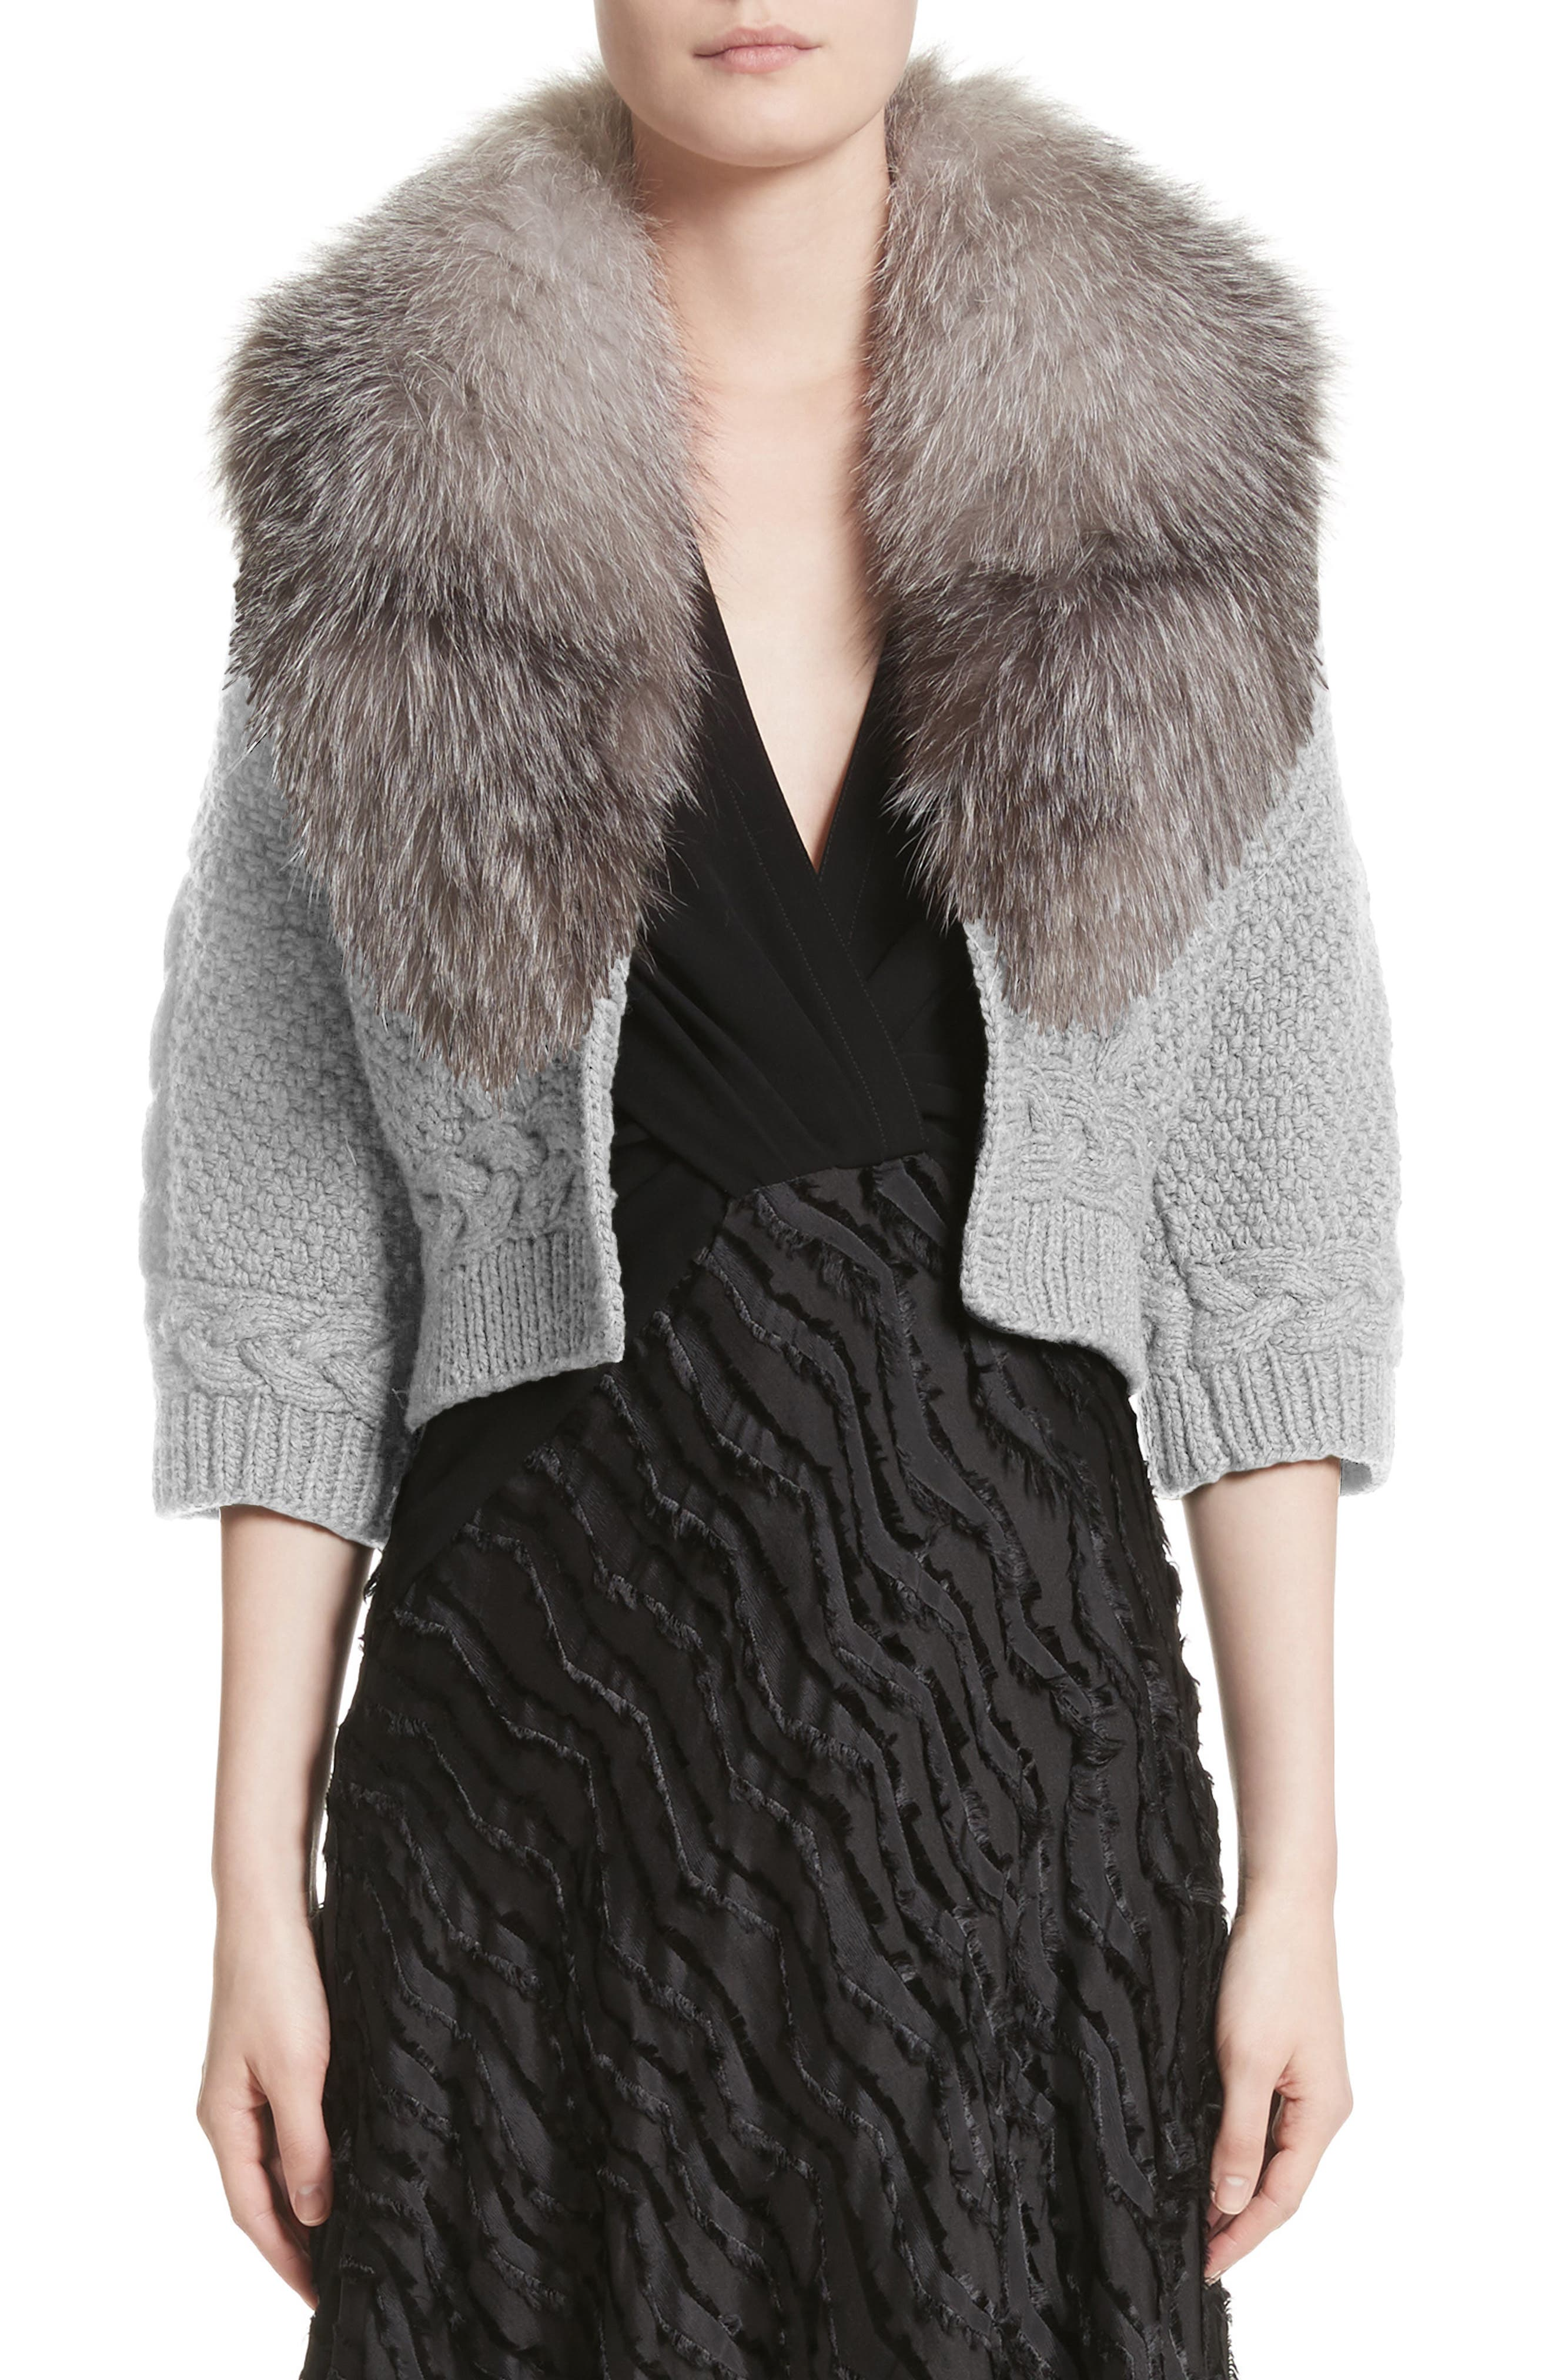 Merino Wool & Cashmere Knit Bolero with Removable Genuine Fox Fur Collar,                         Main,                         color, Grey